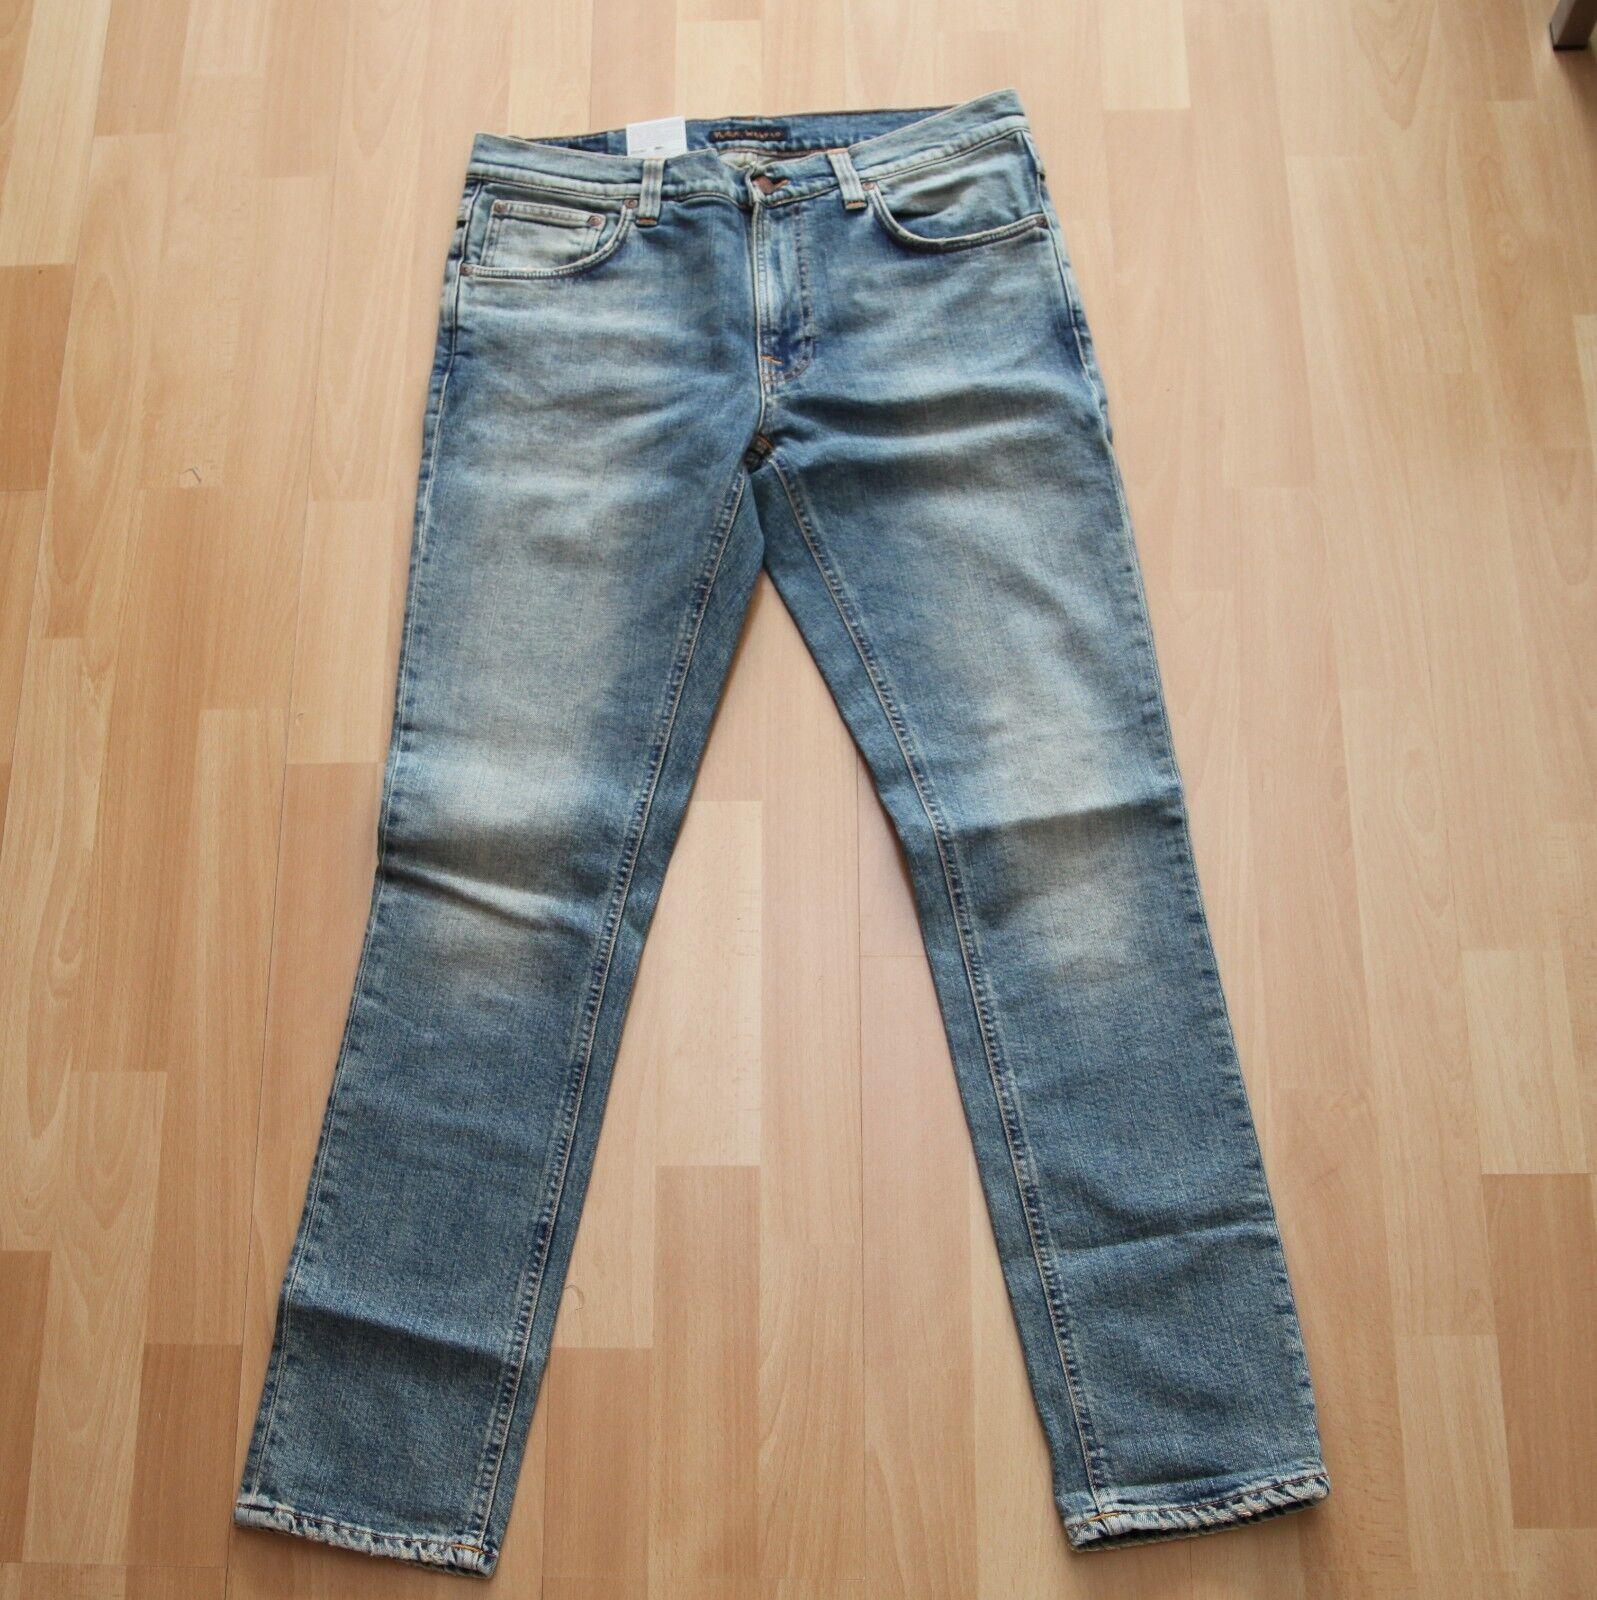 NEU Nudie Jeans Lean Dean (Carrot Shape) Shimmering Comfort 32 32